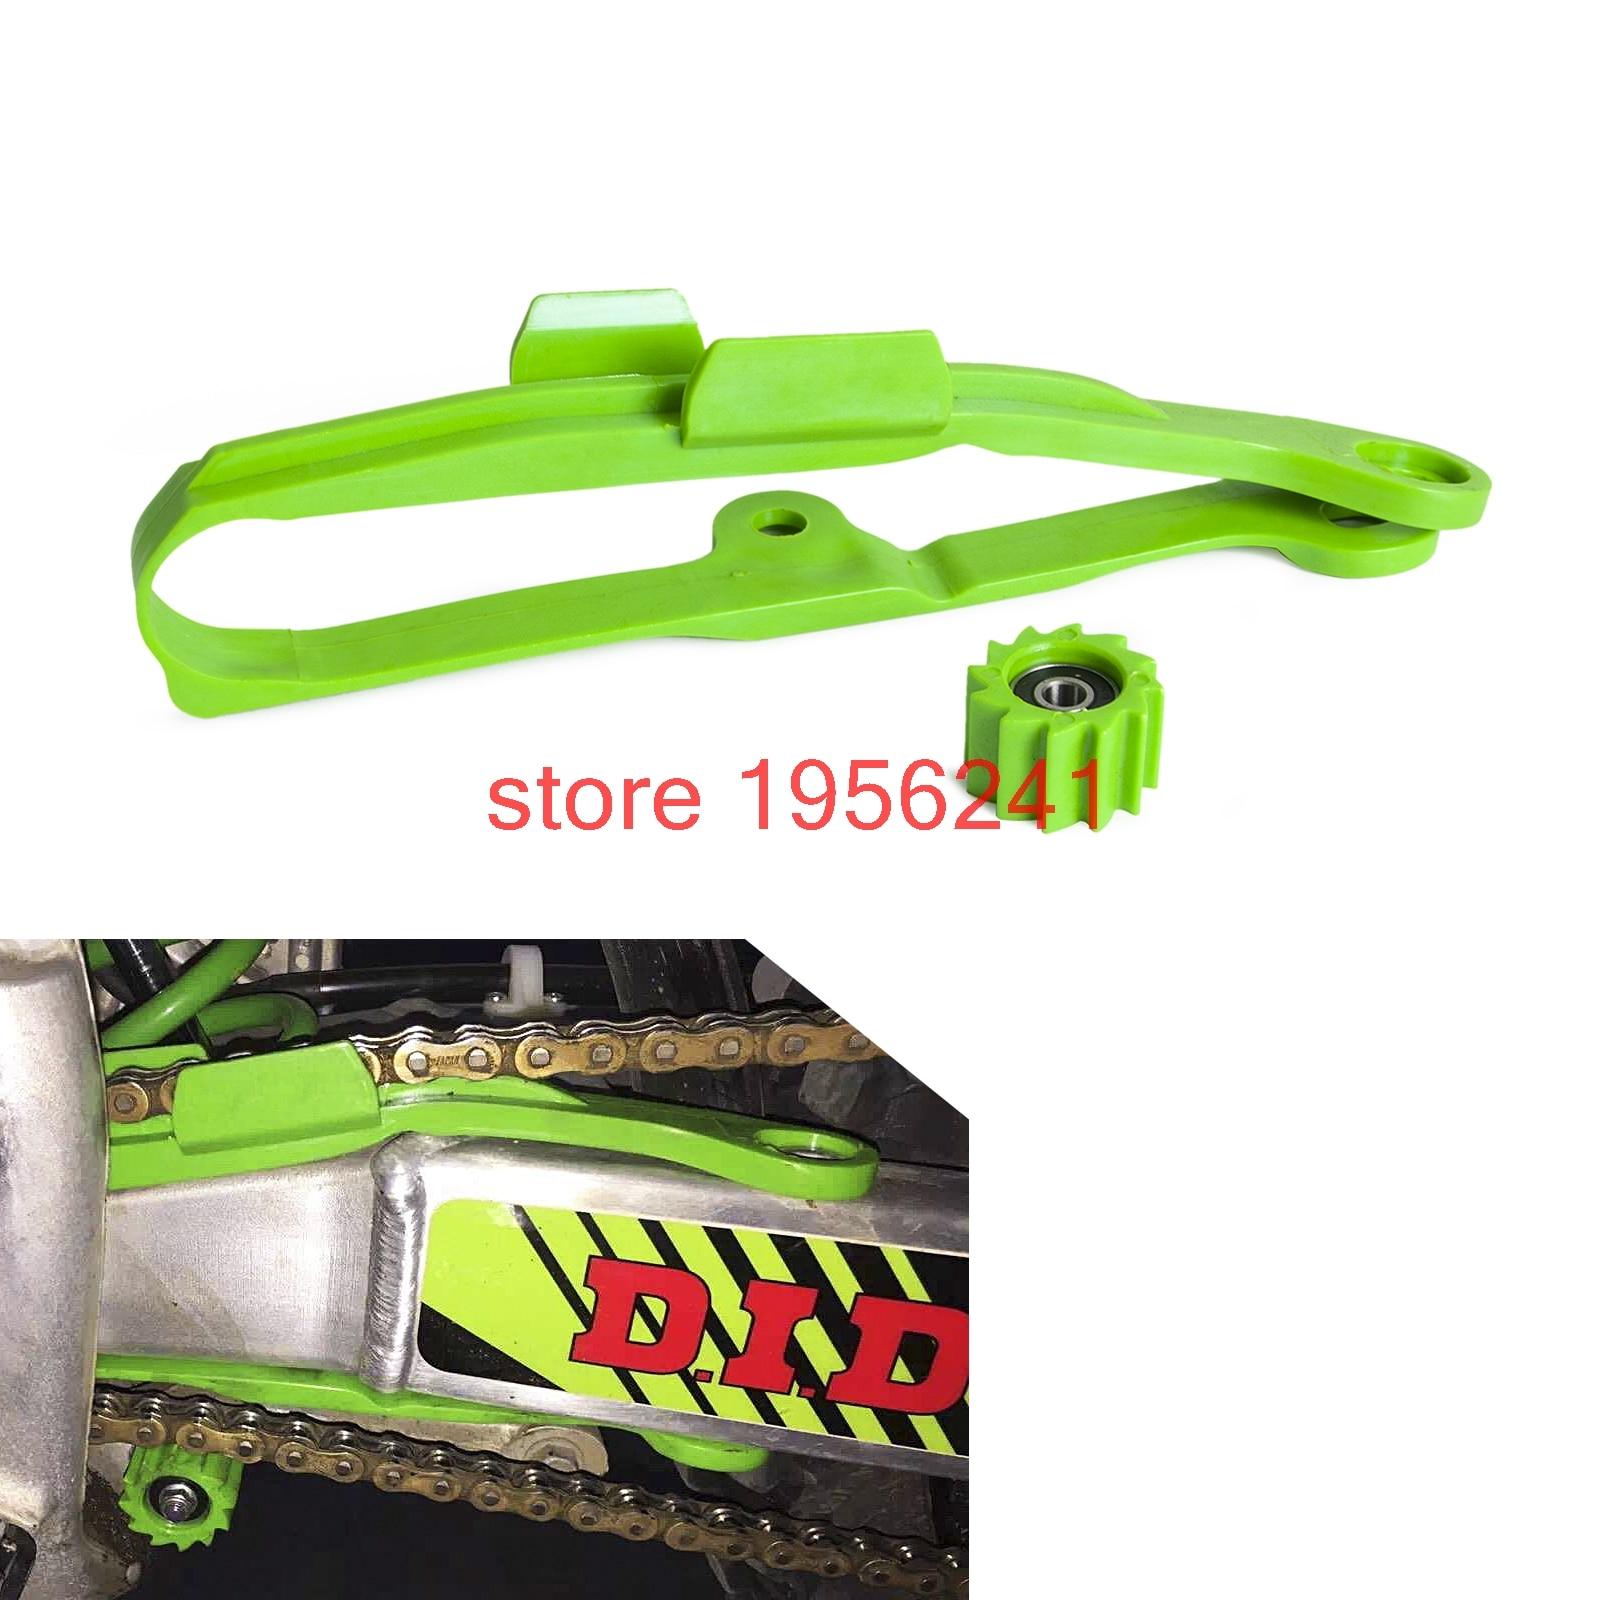 Chaîne Curseur Garde Curseur Kit pour Kawasaki KX250F KXF250 KX450F KXF450 2006-2016 KXF 250 450